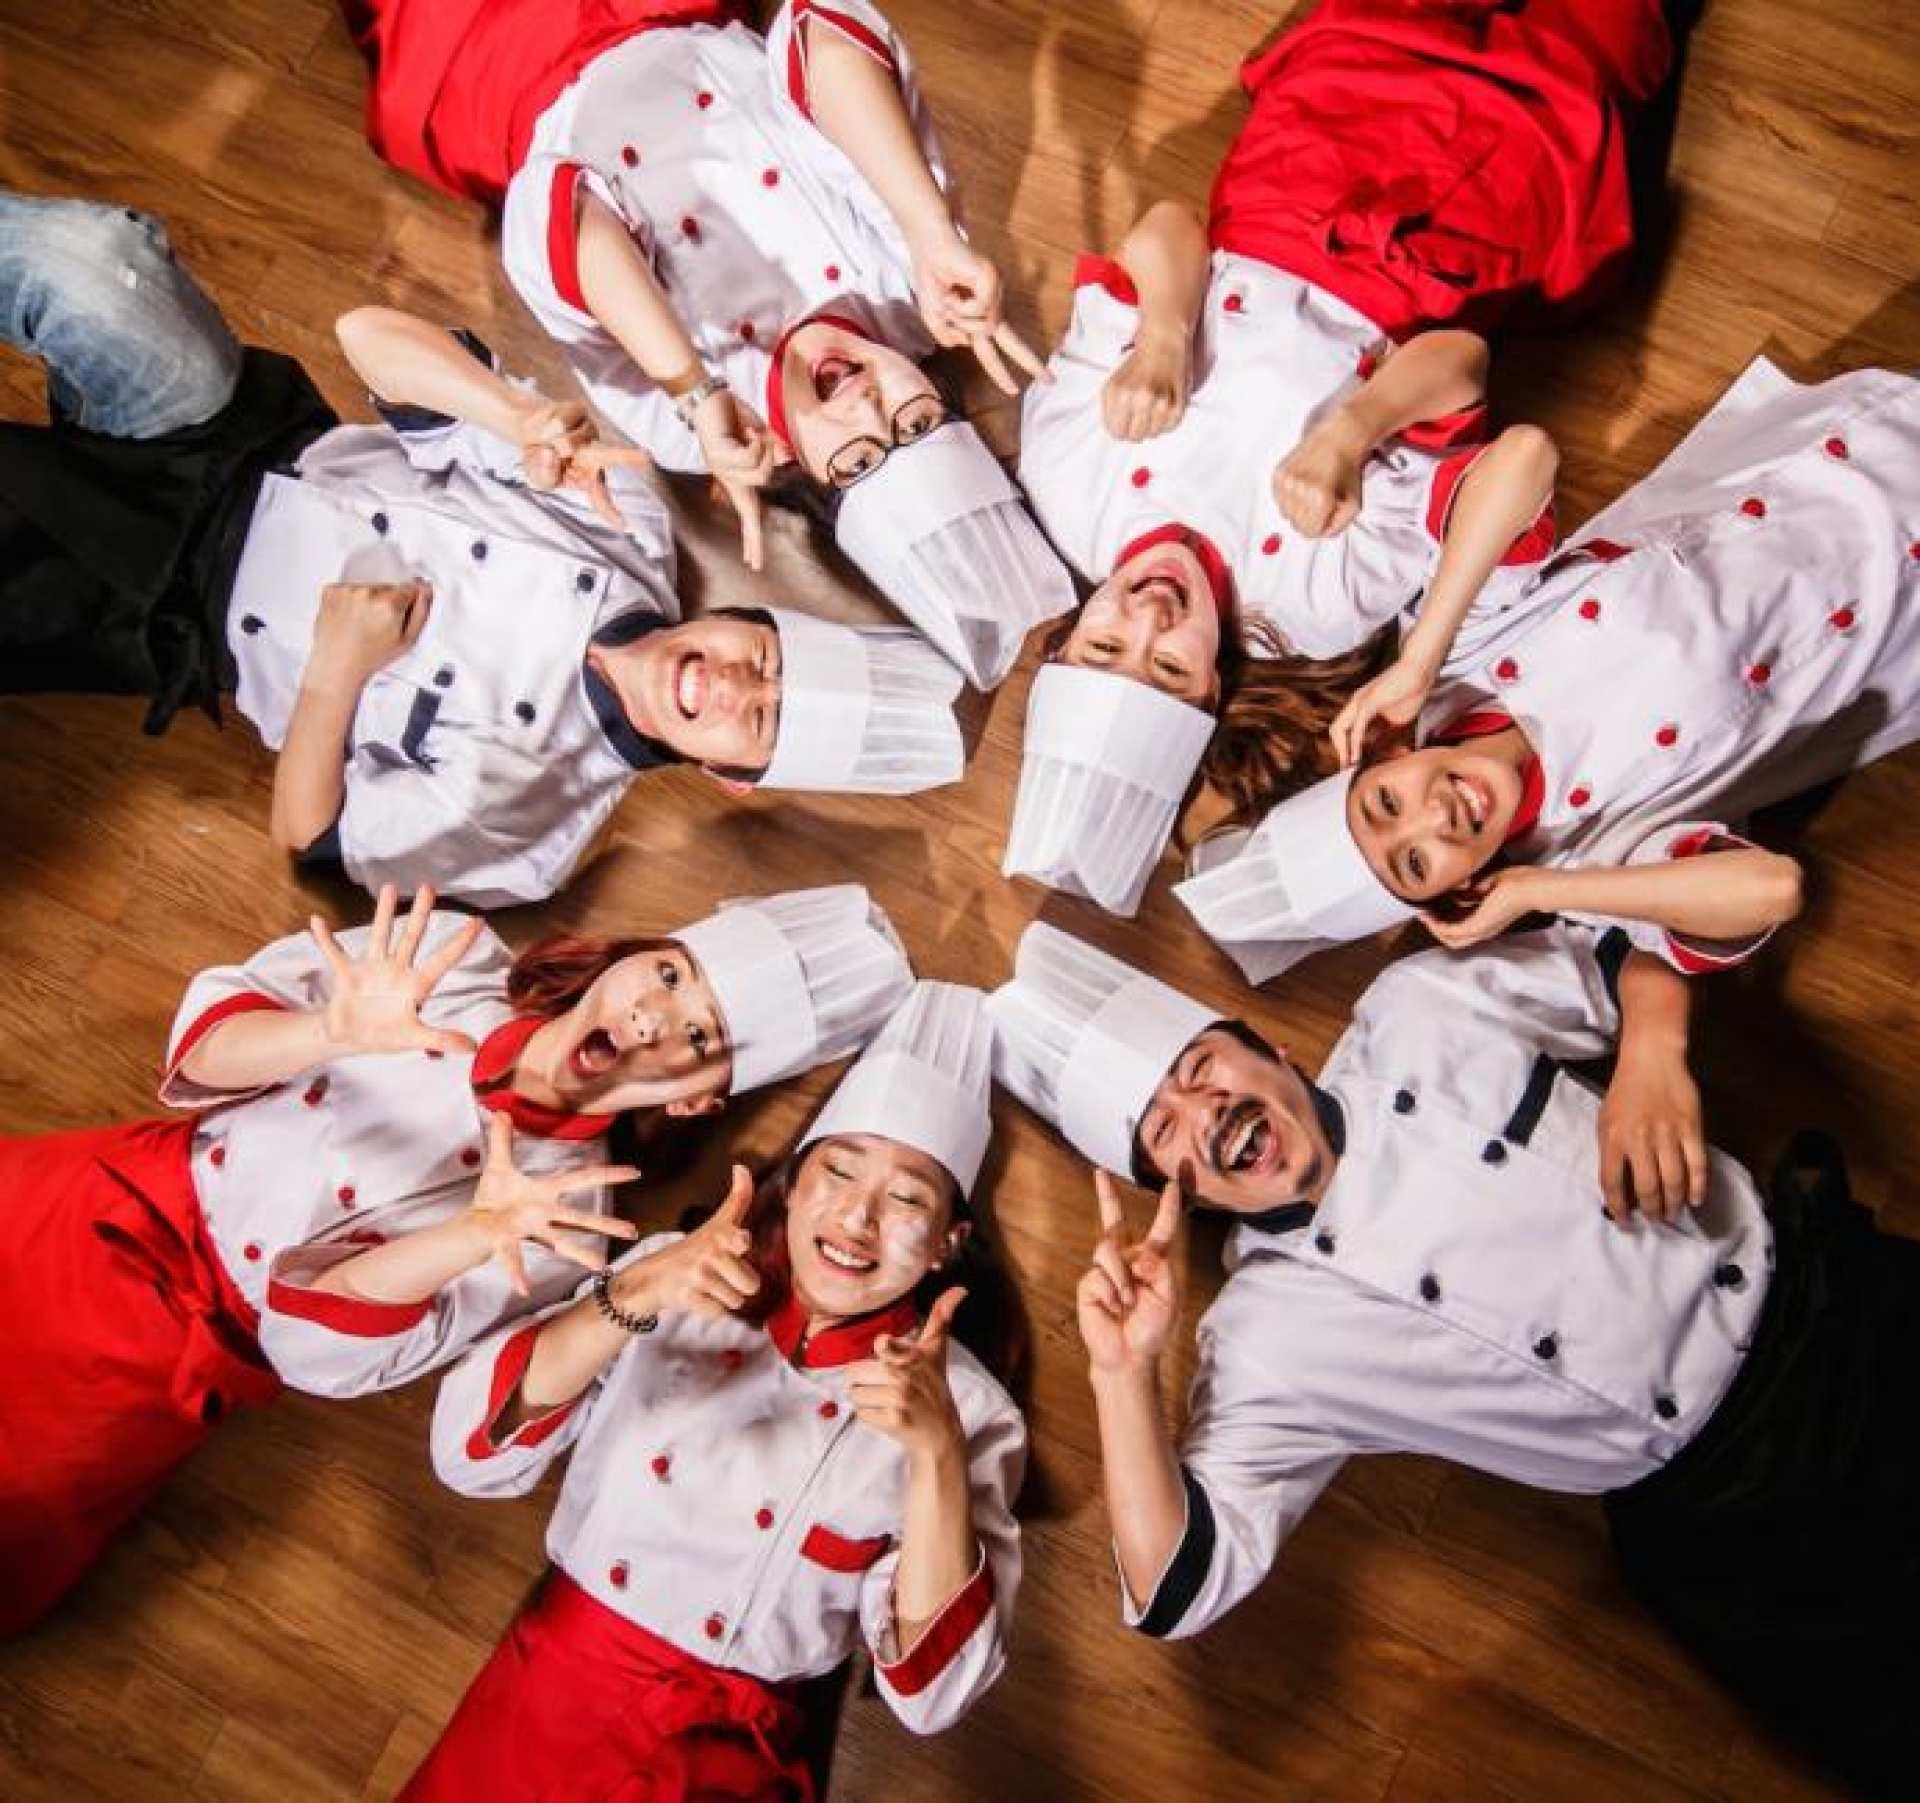 【2019 Welcome Daehak-ro Performing Arts Festival】漢江クルーズ:製パン体験+「製パン王キム・タック」ショー鑑賞プラン